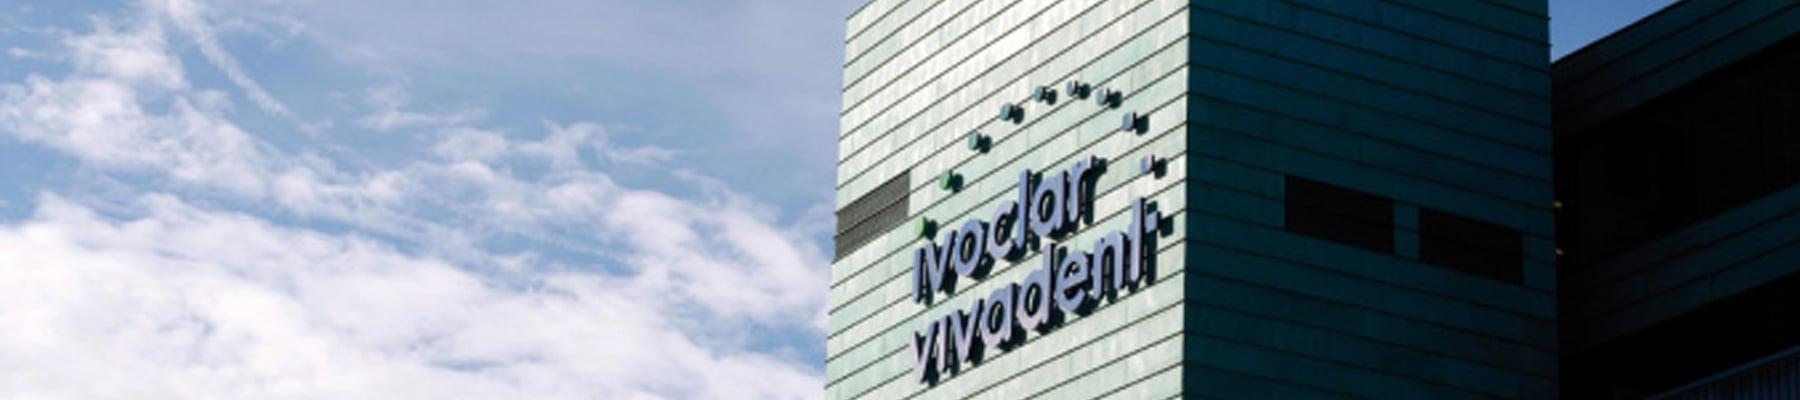 verde-ivoclar-vivadent1-banner